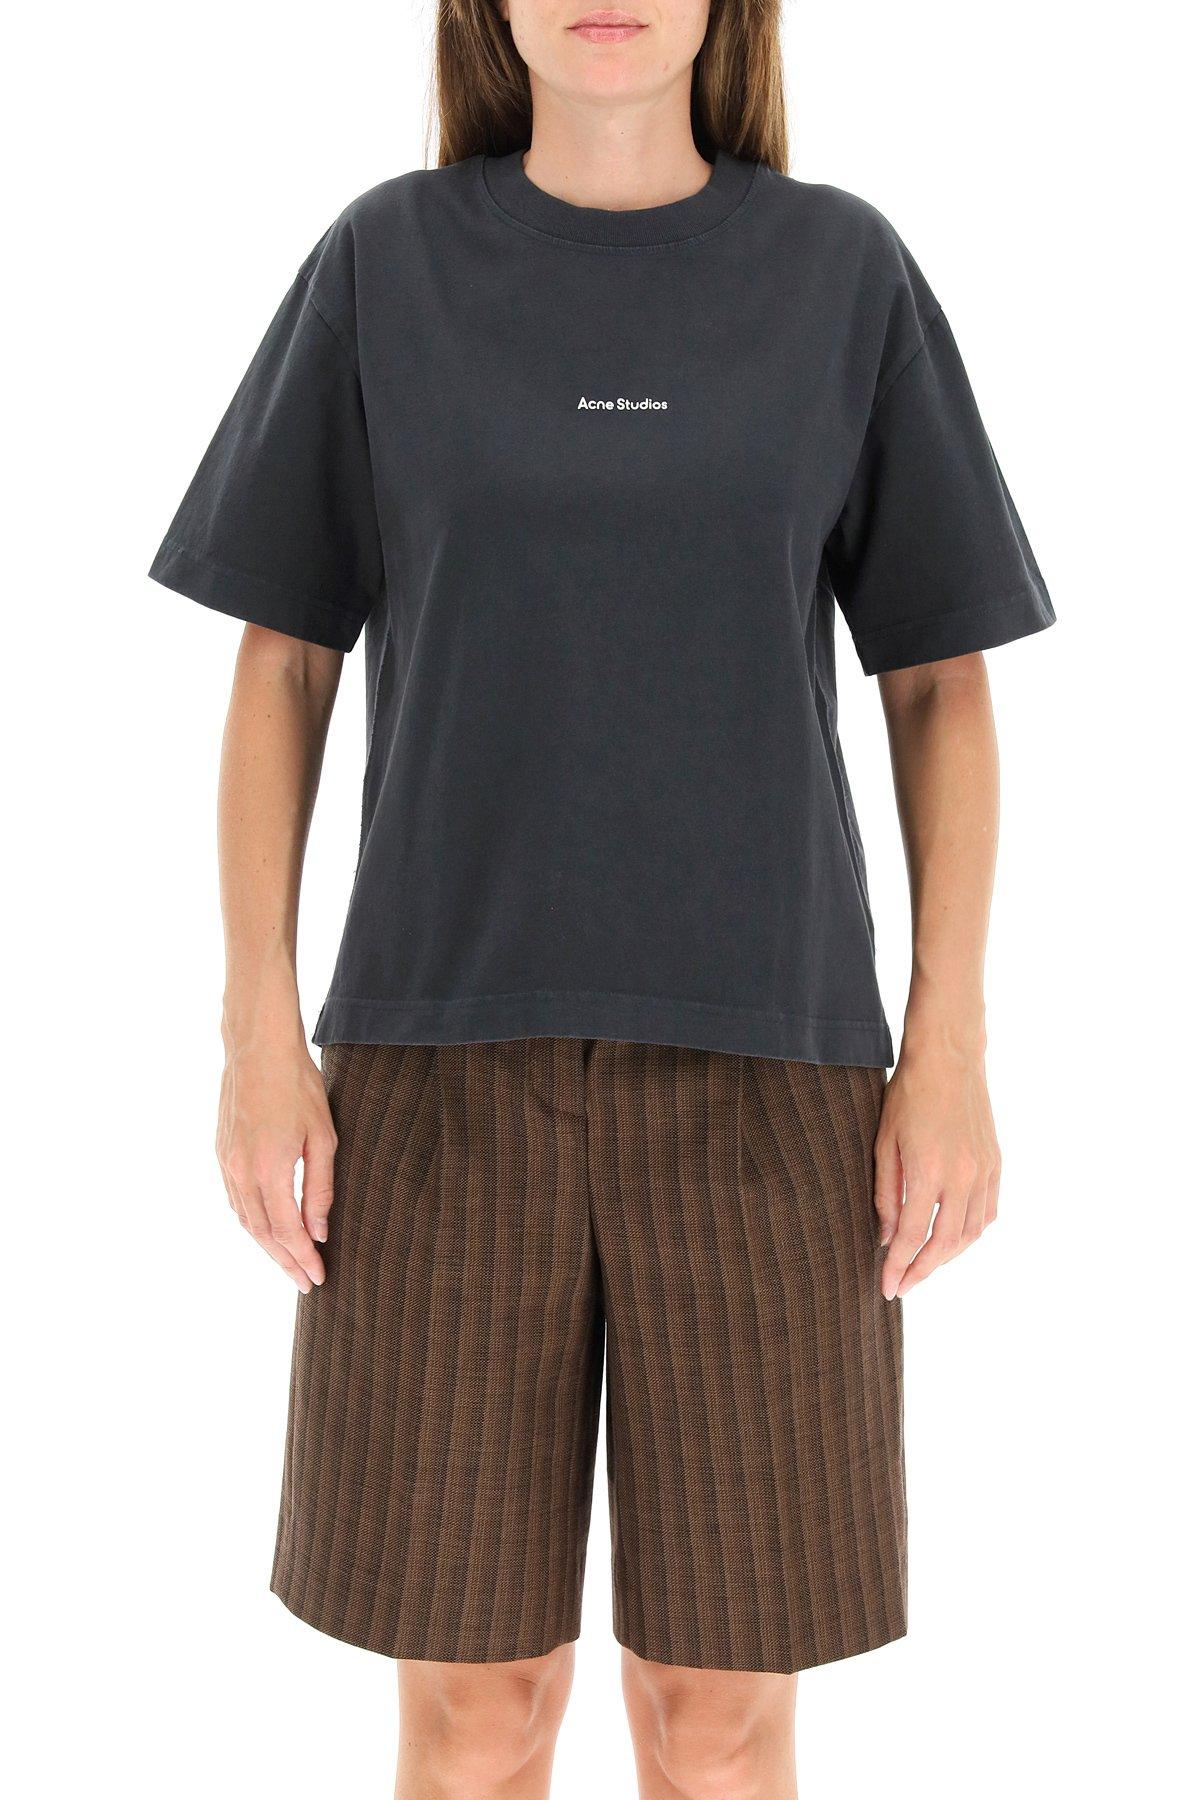 Acne studios t-shirt con stampa logo